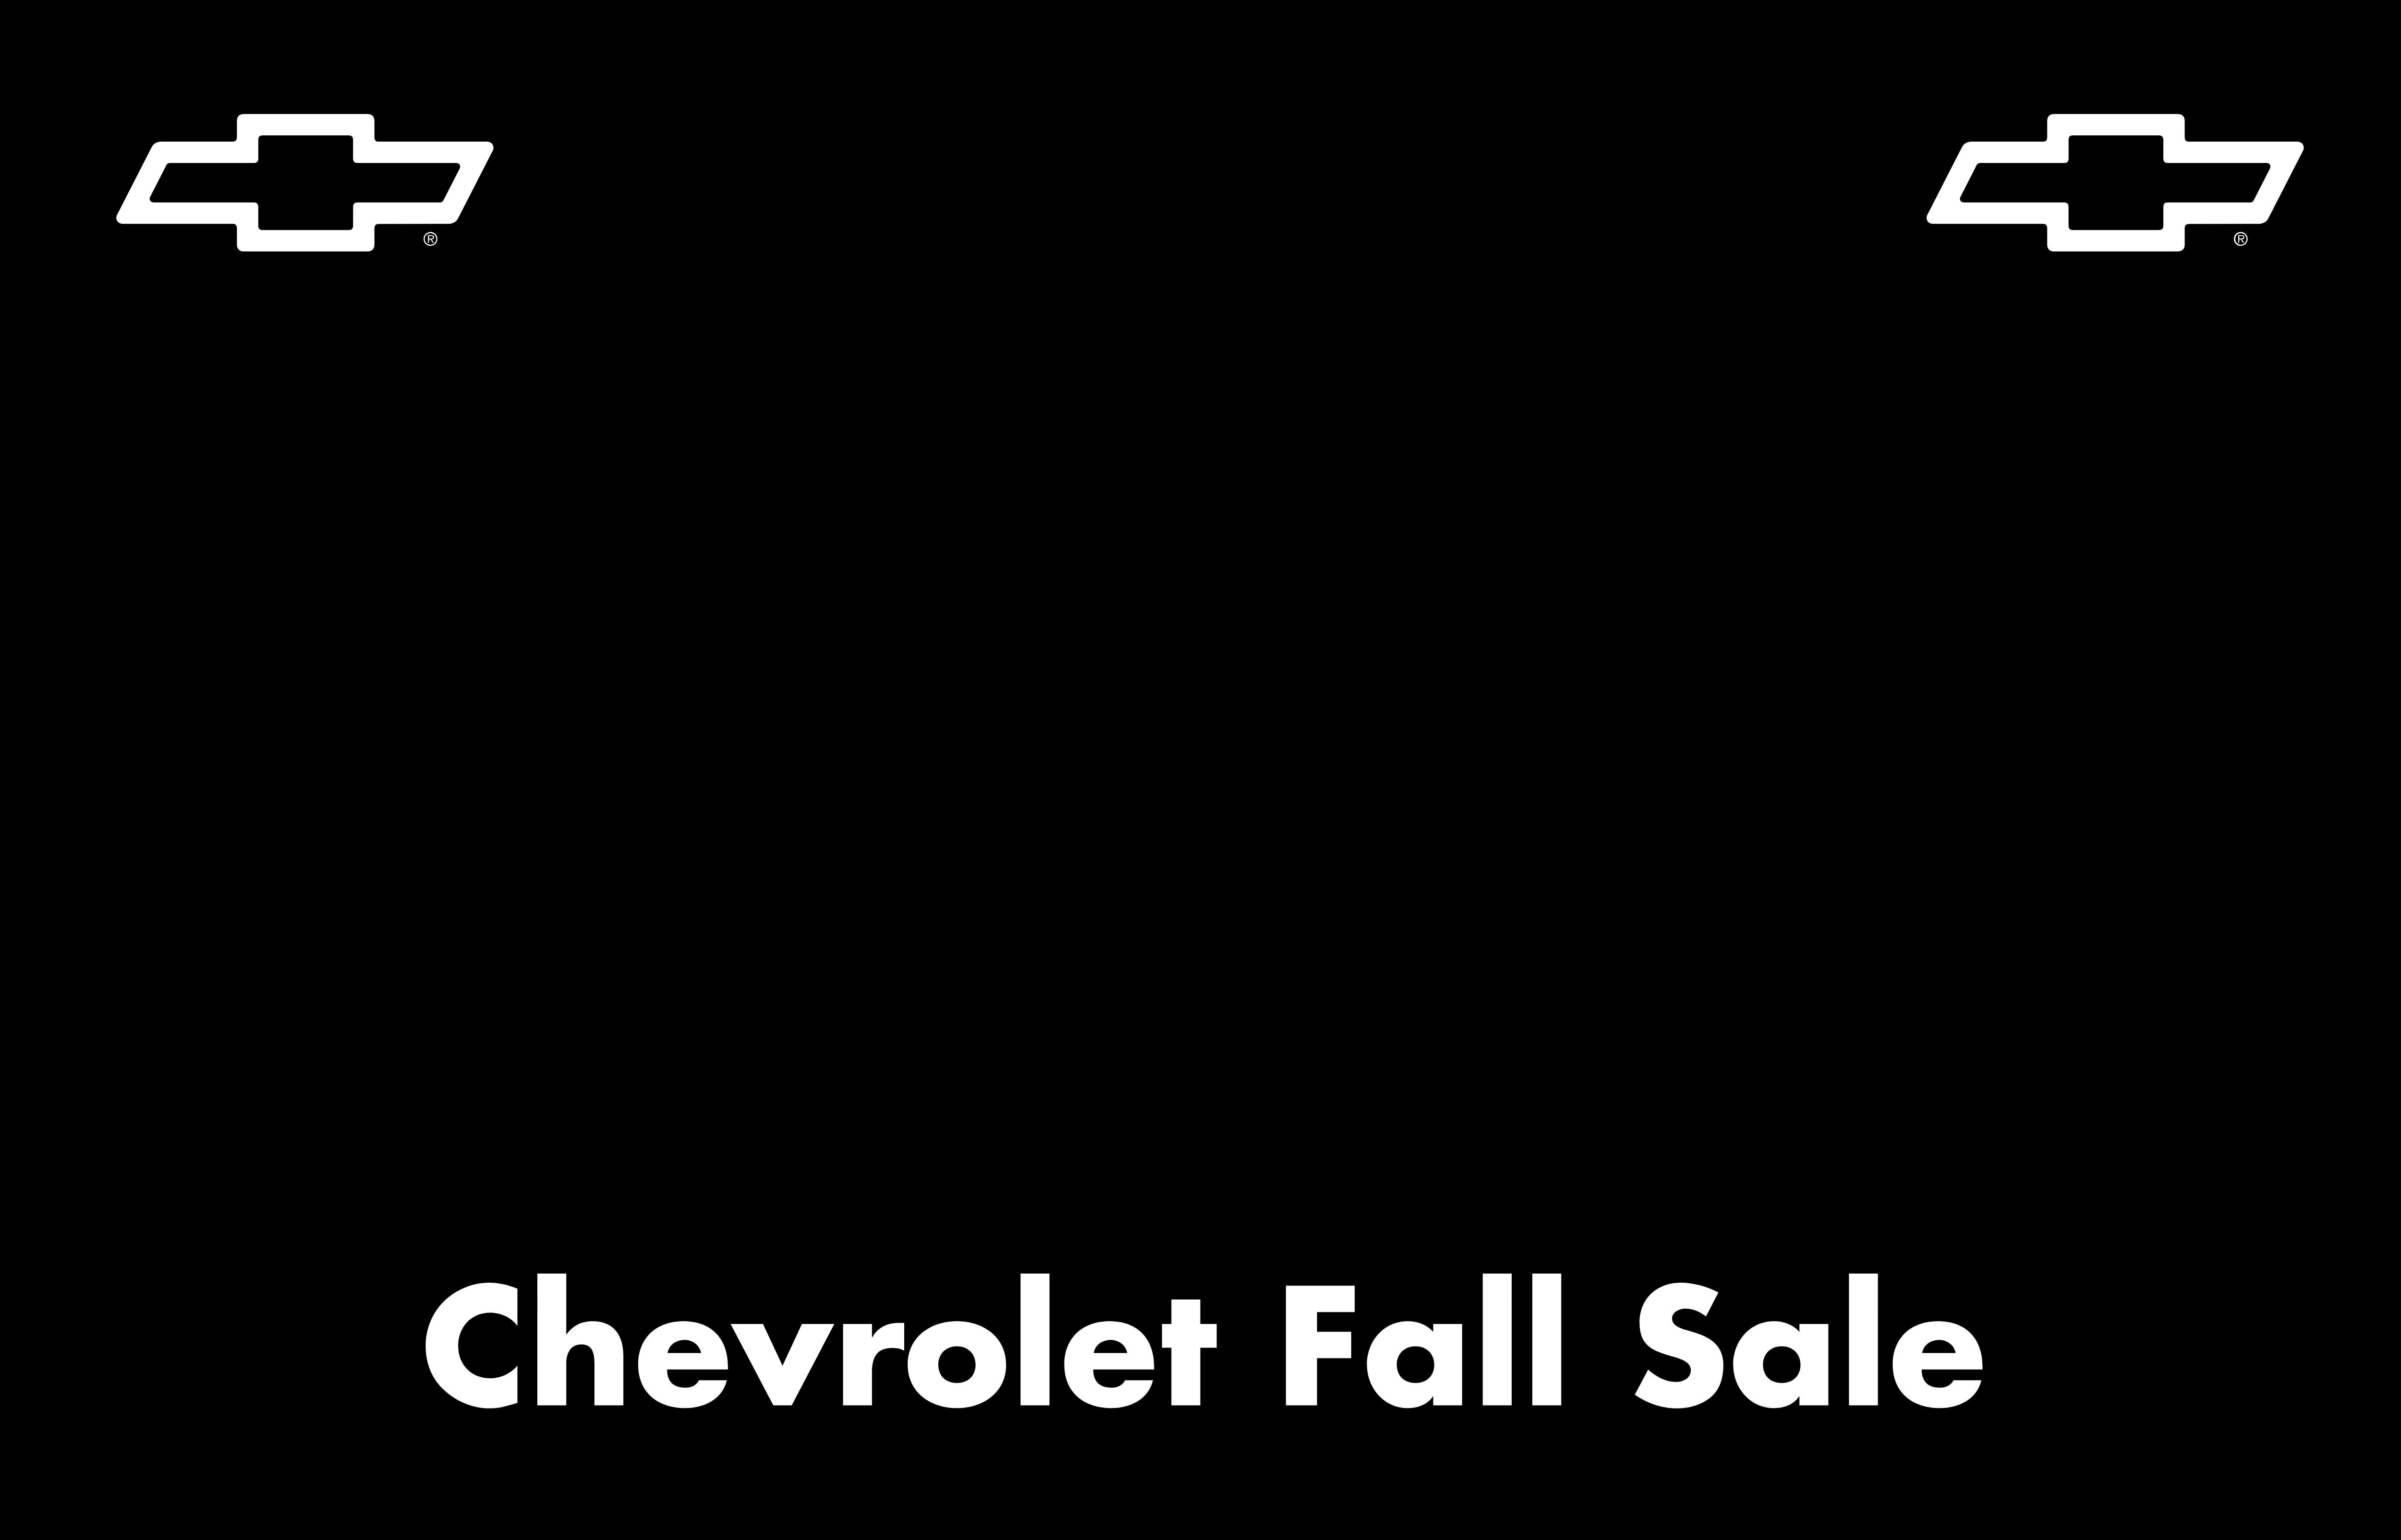 Chevrolet Lease Deals >> Chevrolet – Logos Download